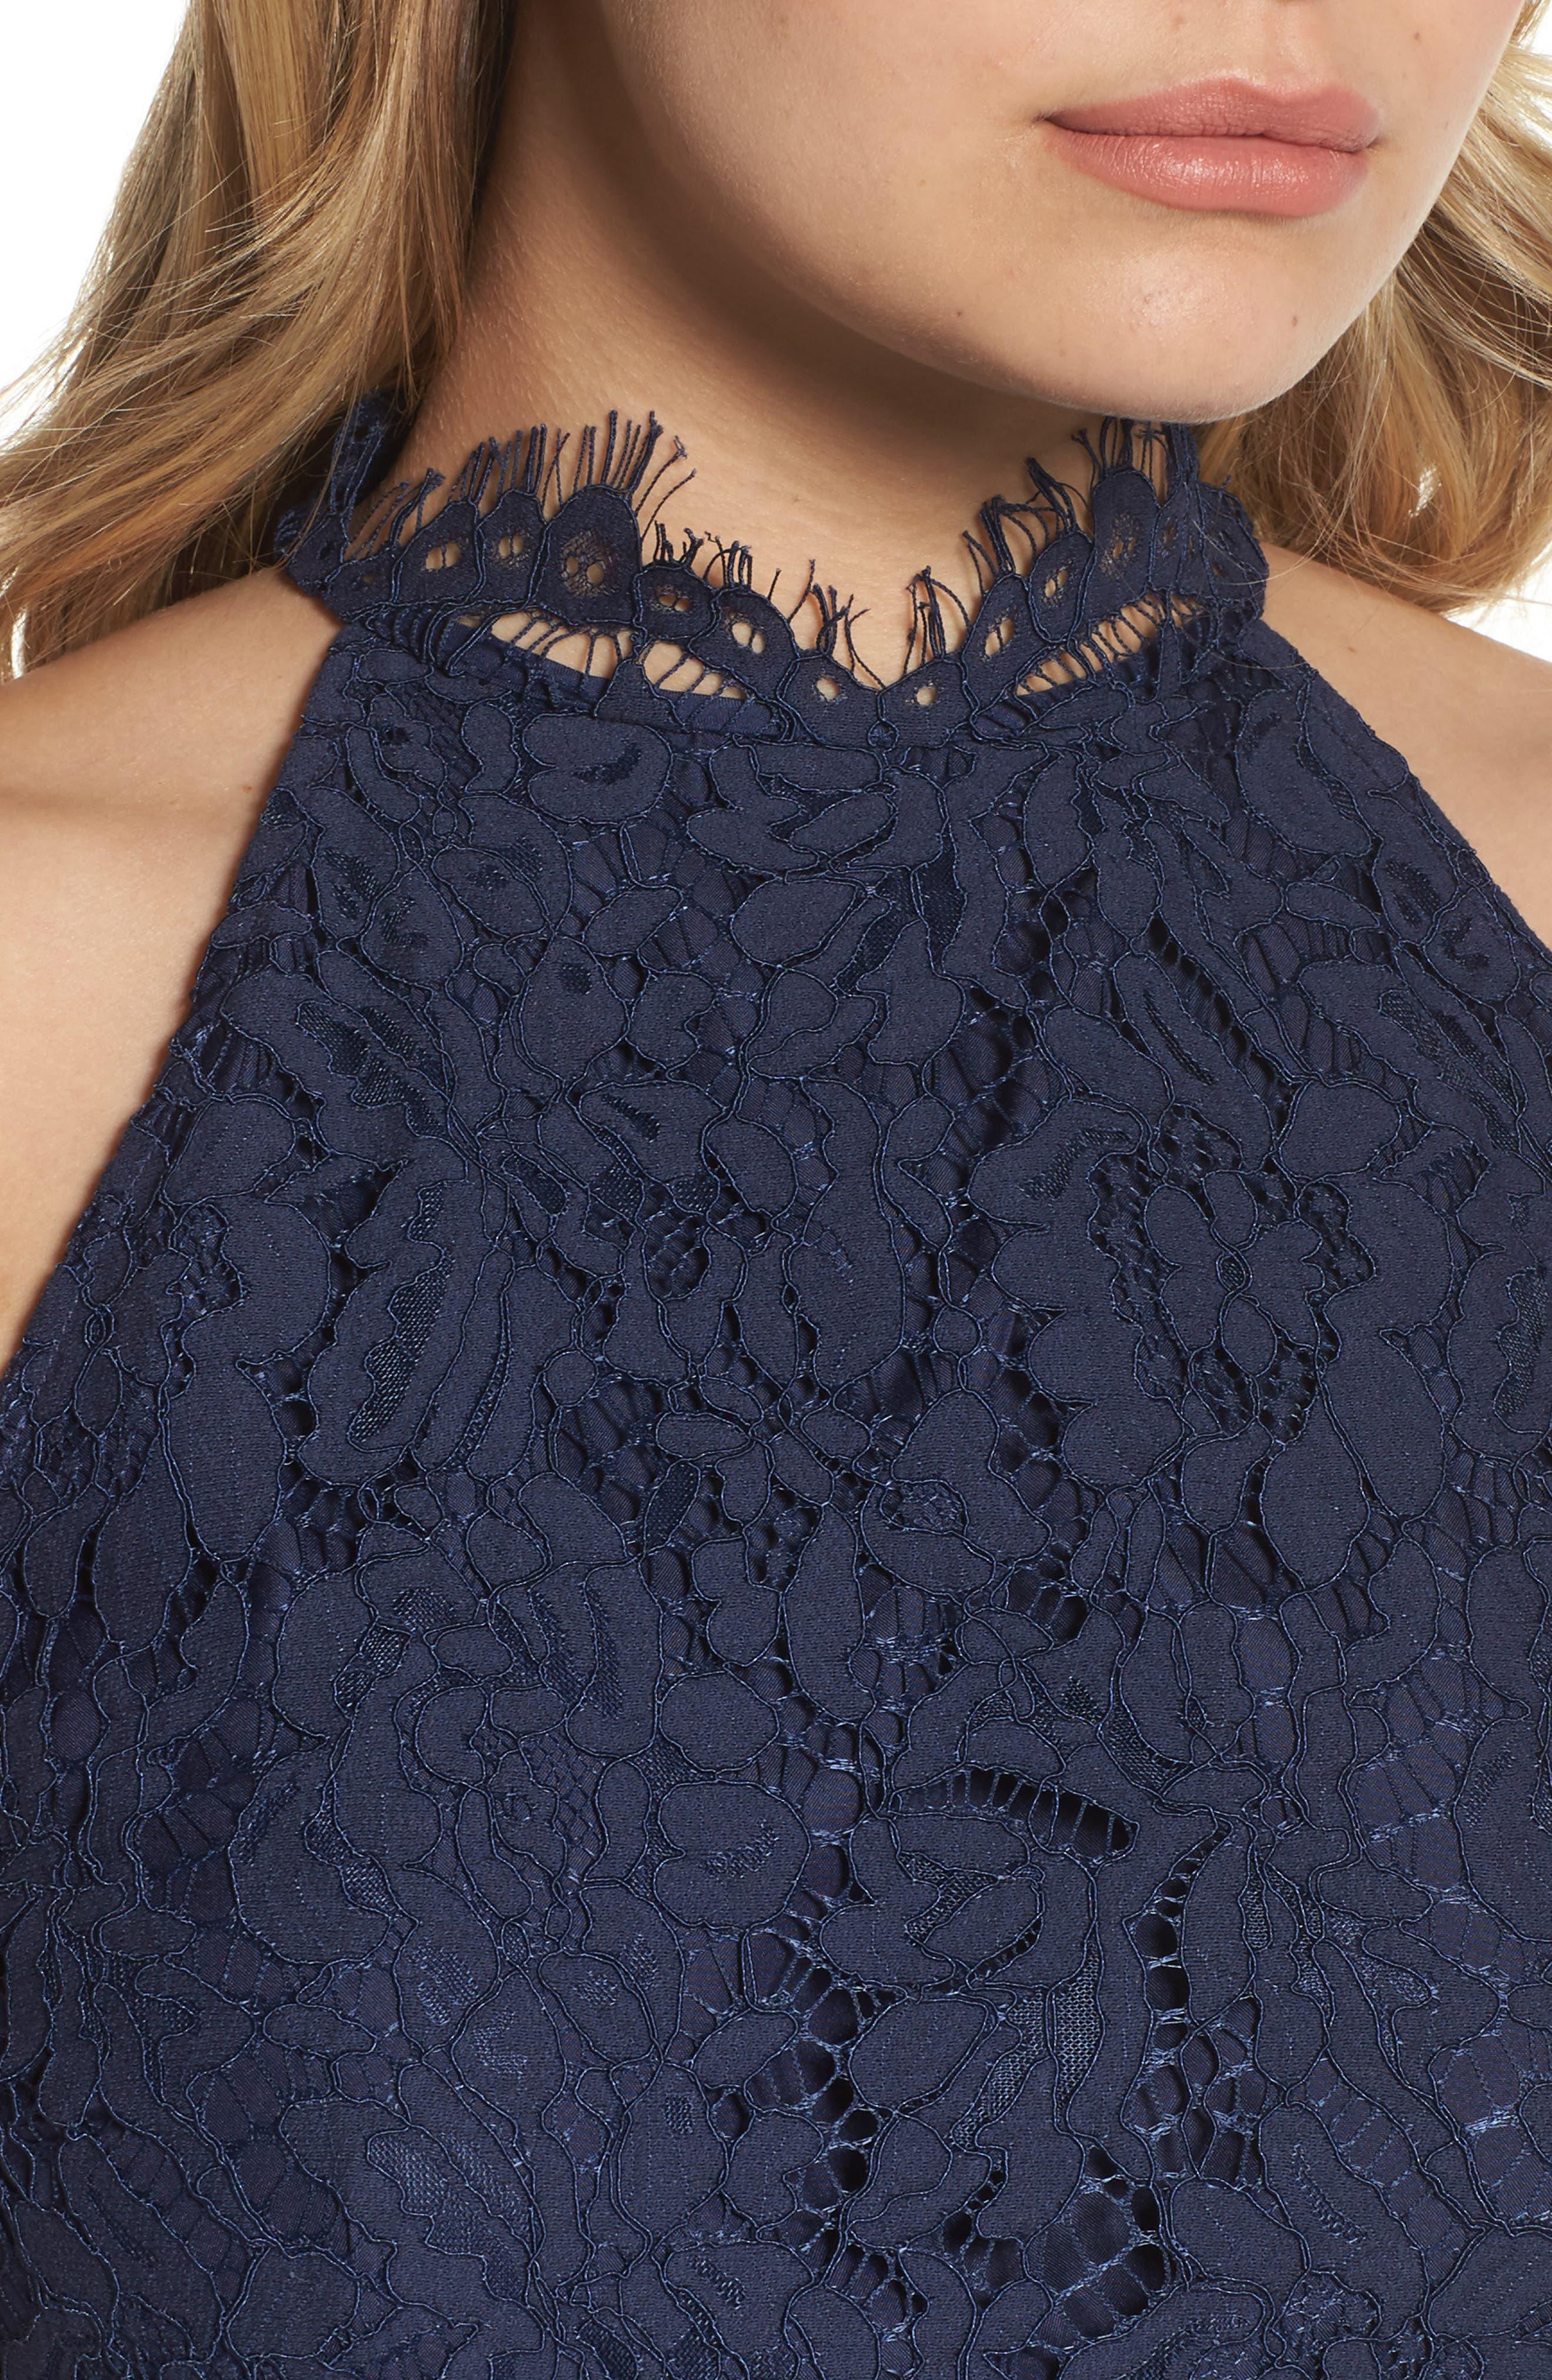 'Cara' High Neck Lace Dress,                             Alternate thumbnail 4, color,                             NAVY